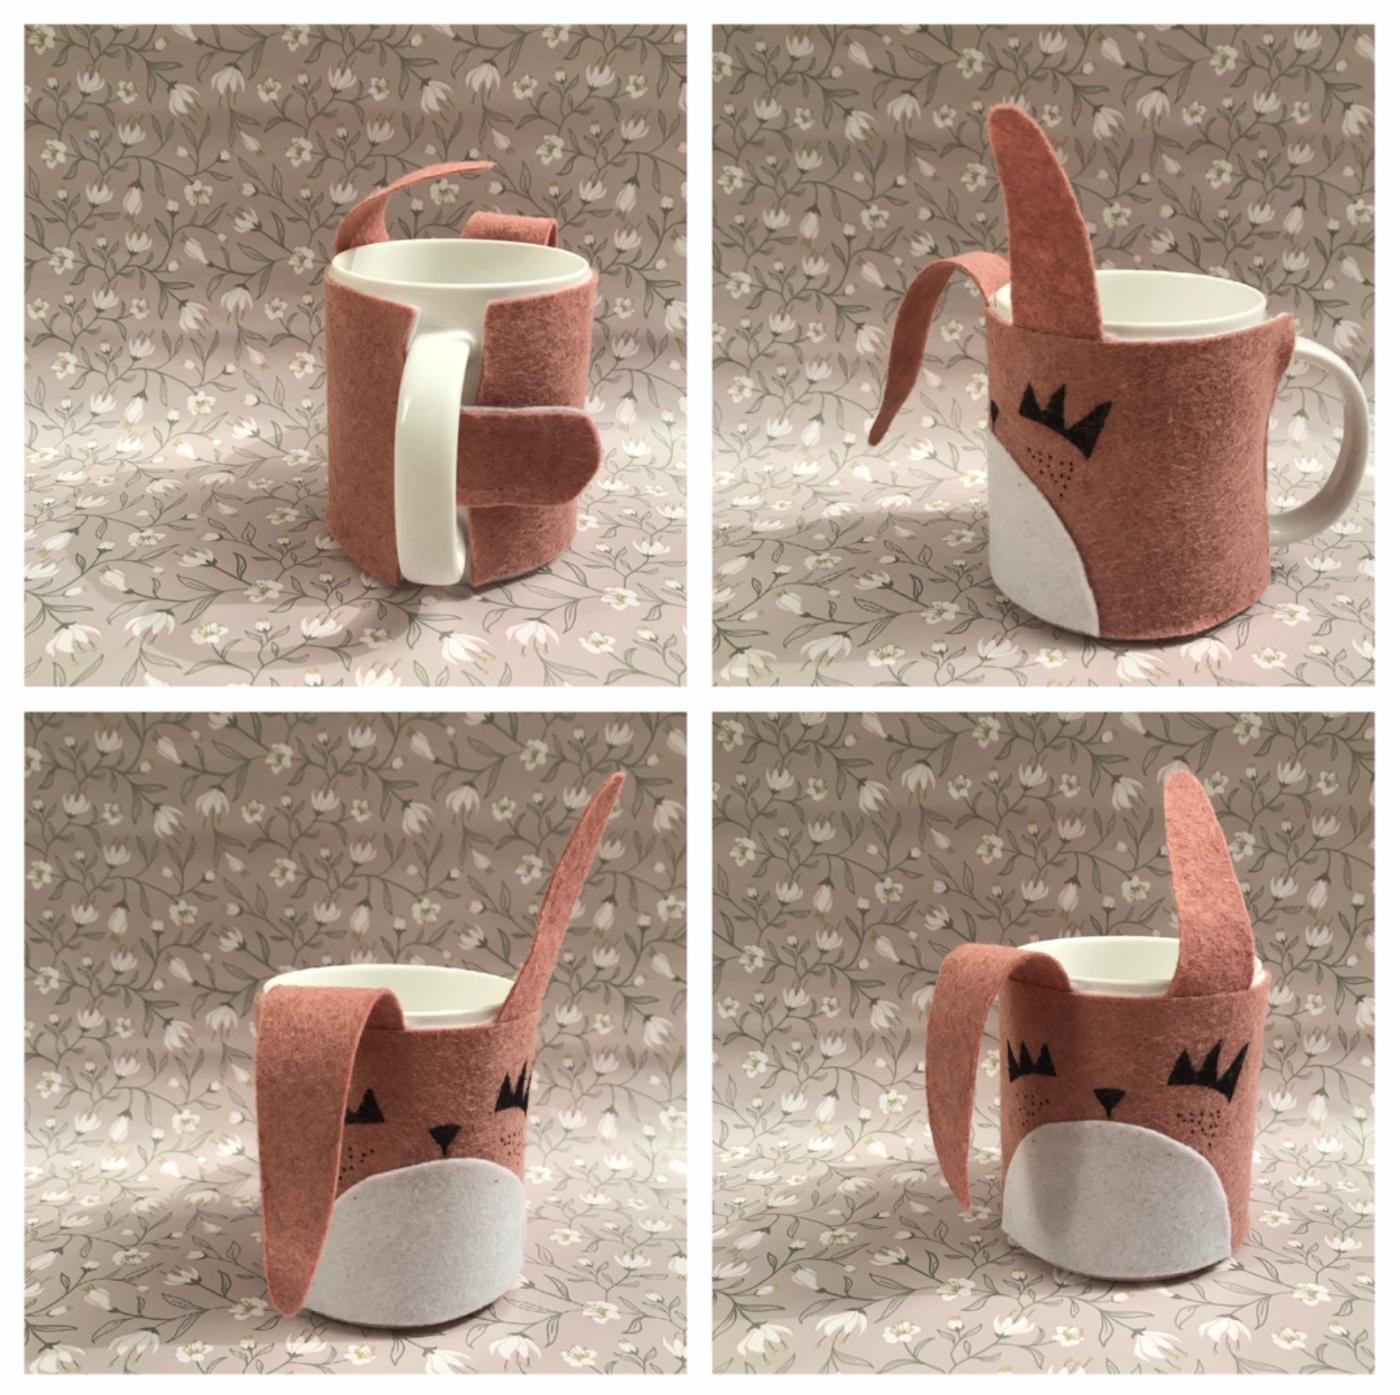 Réchauffe ton mug - DIY - bricolage enfants - craft for kids - protège mug - feutrine - lapin